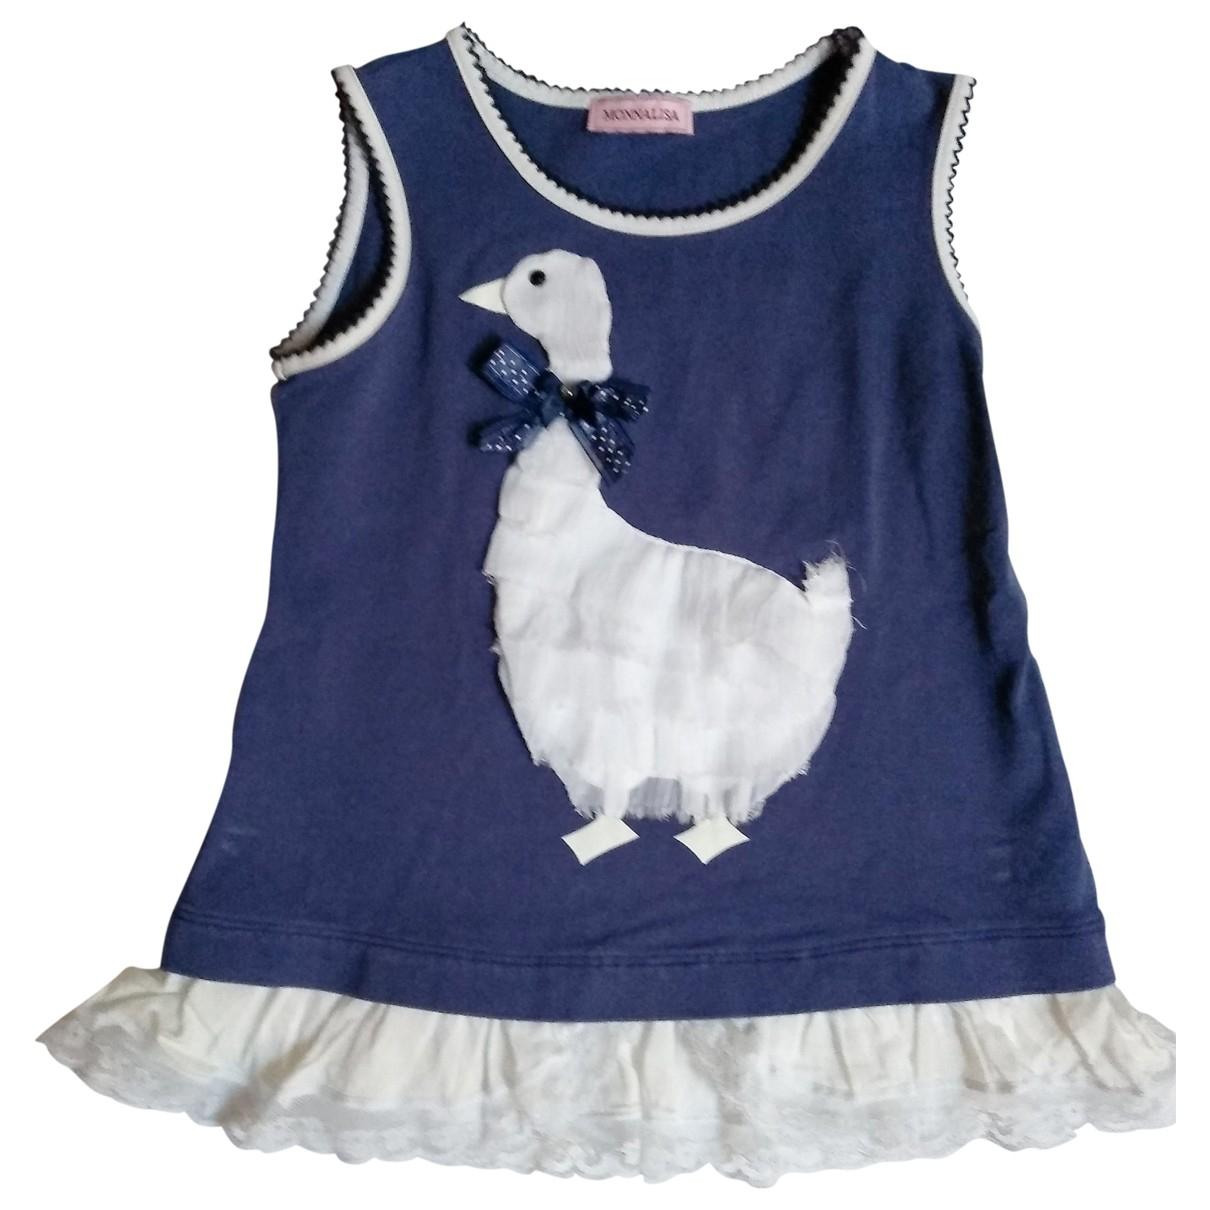 Monnalisa - Top   pour enfant en coton - bleu